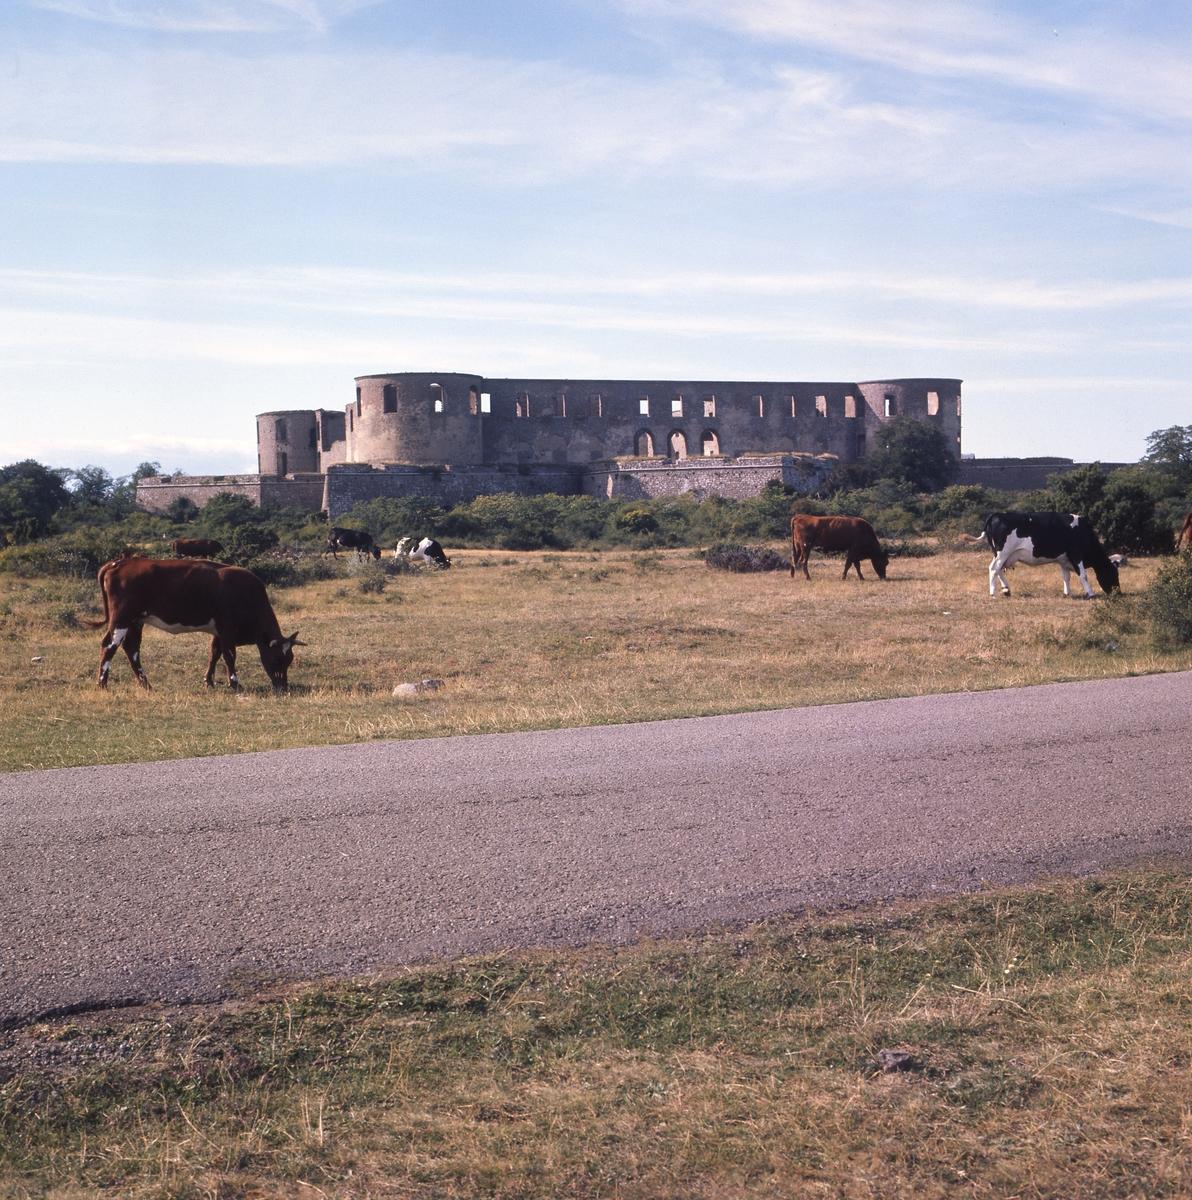 Borgholms slottsruin, Öland 1976.